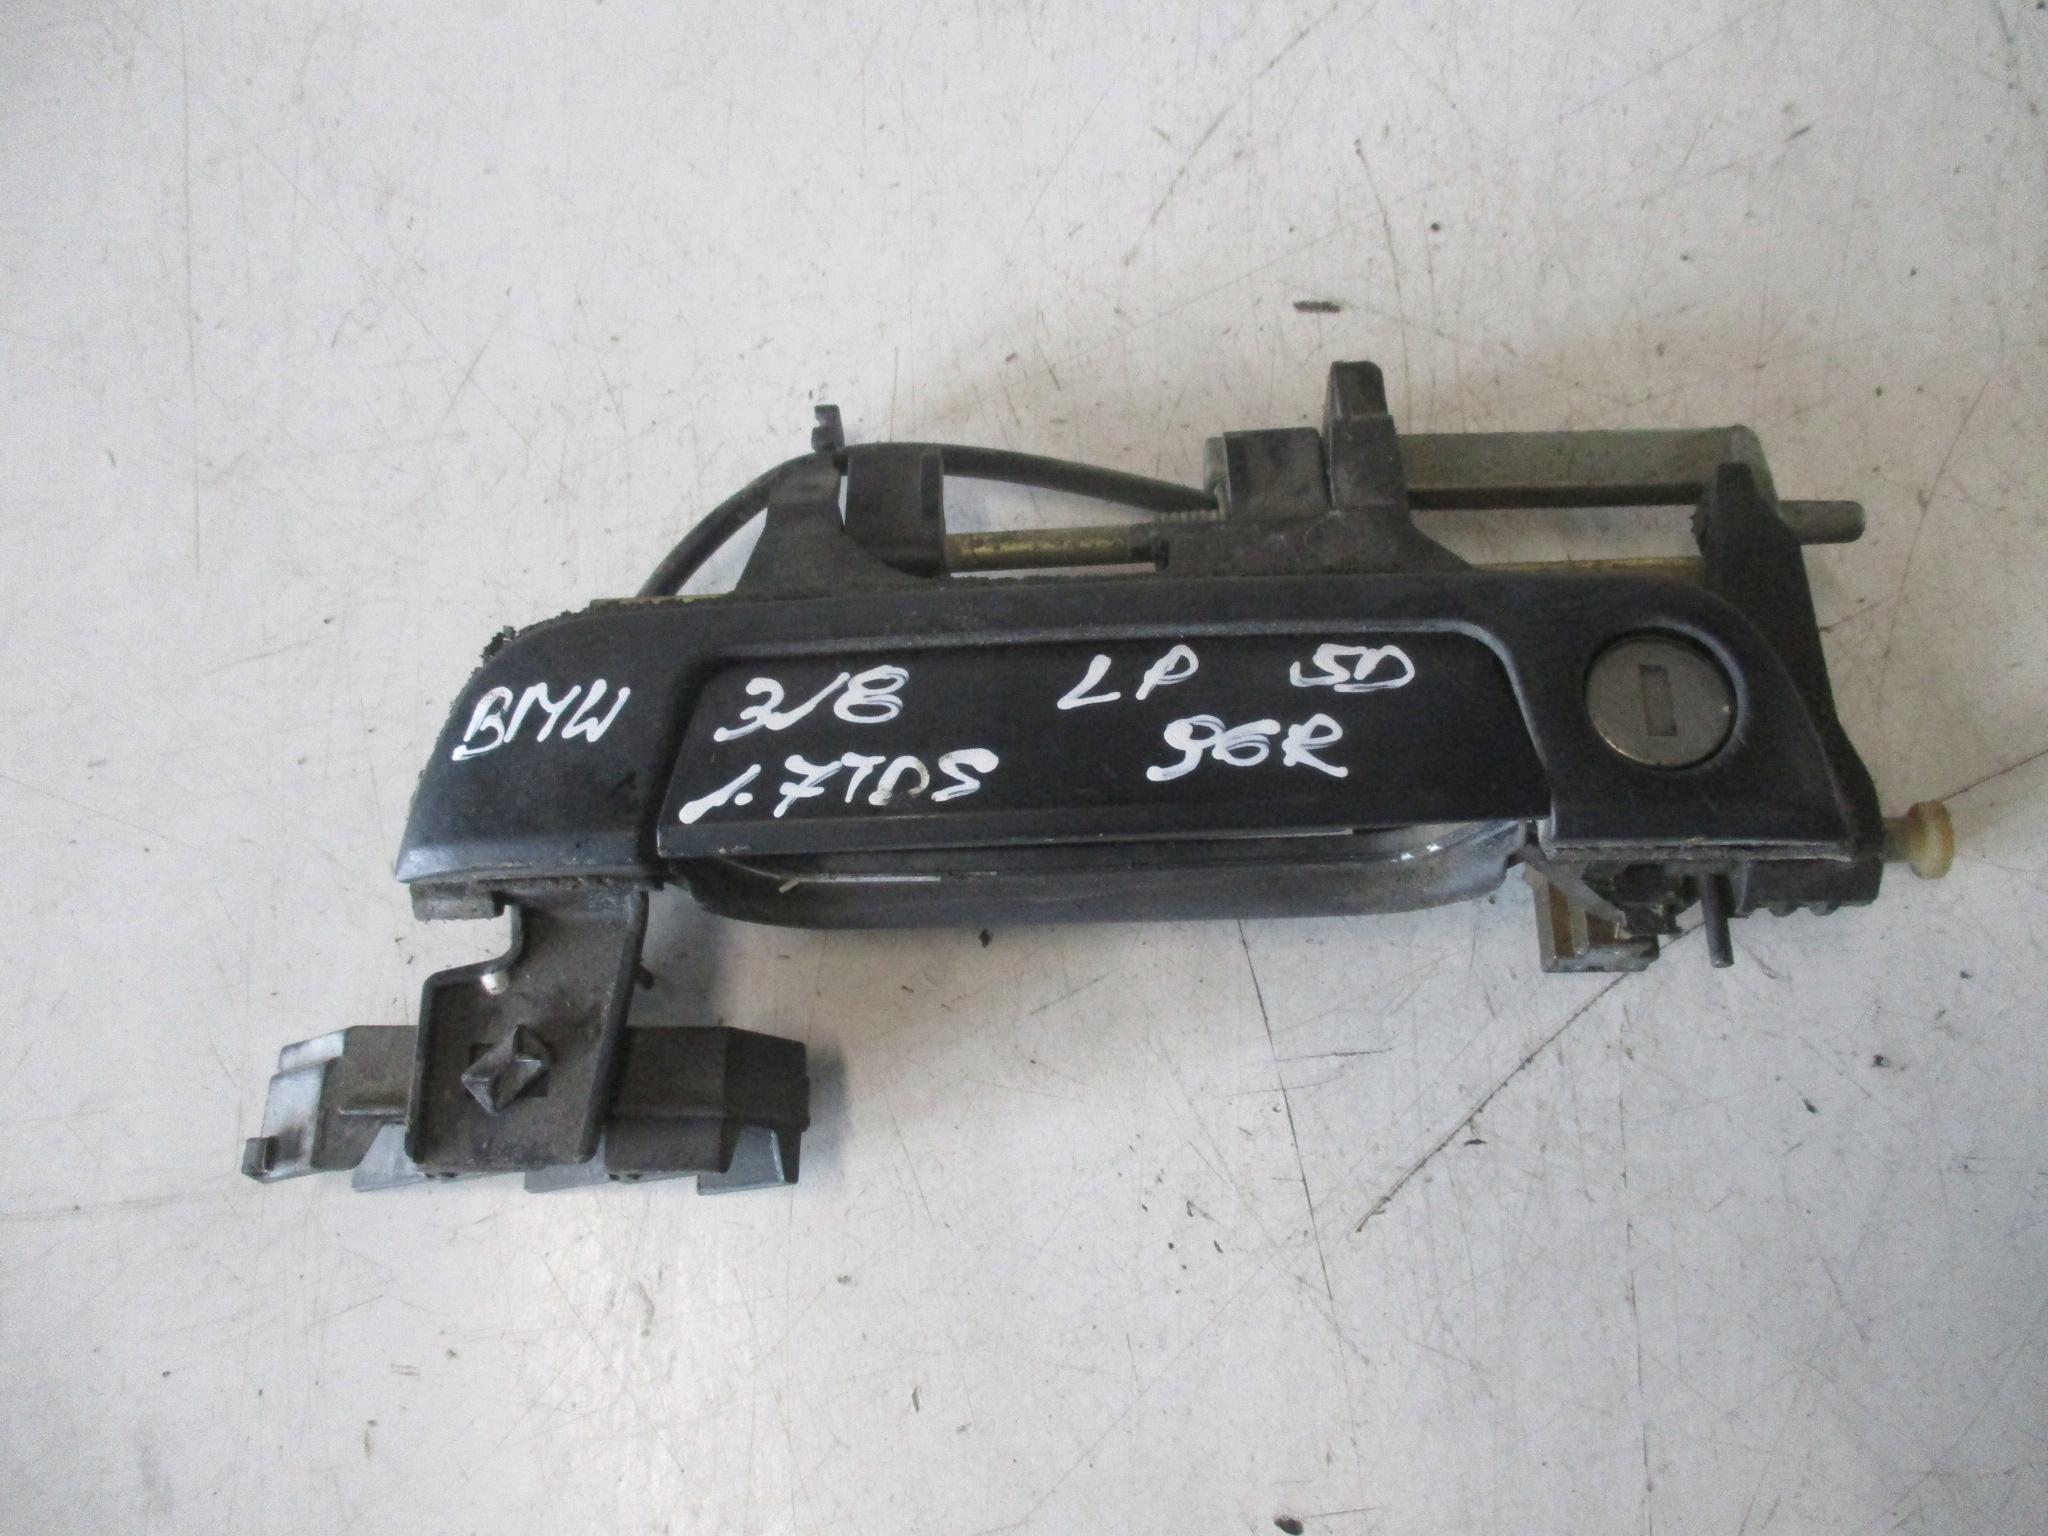 KLAMKA PRZEDNIA LEWA BMW E36 5D 96R